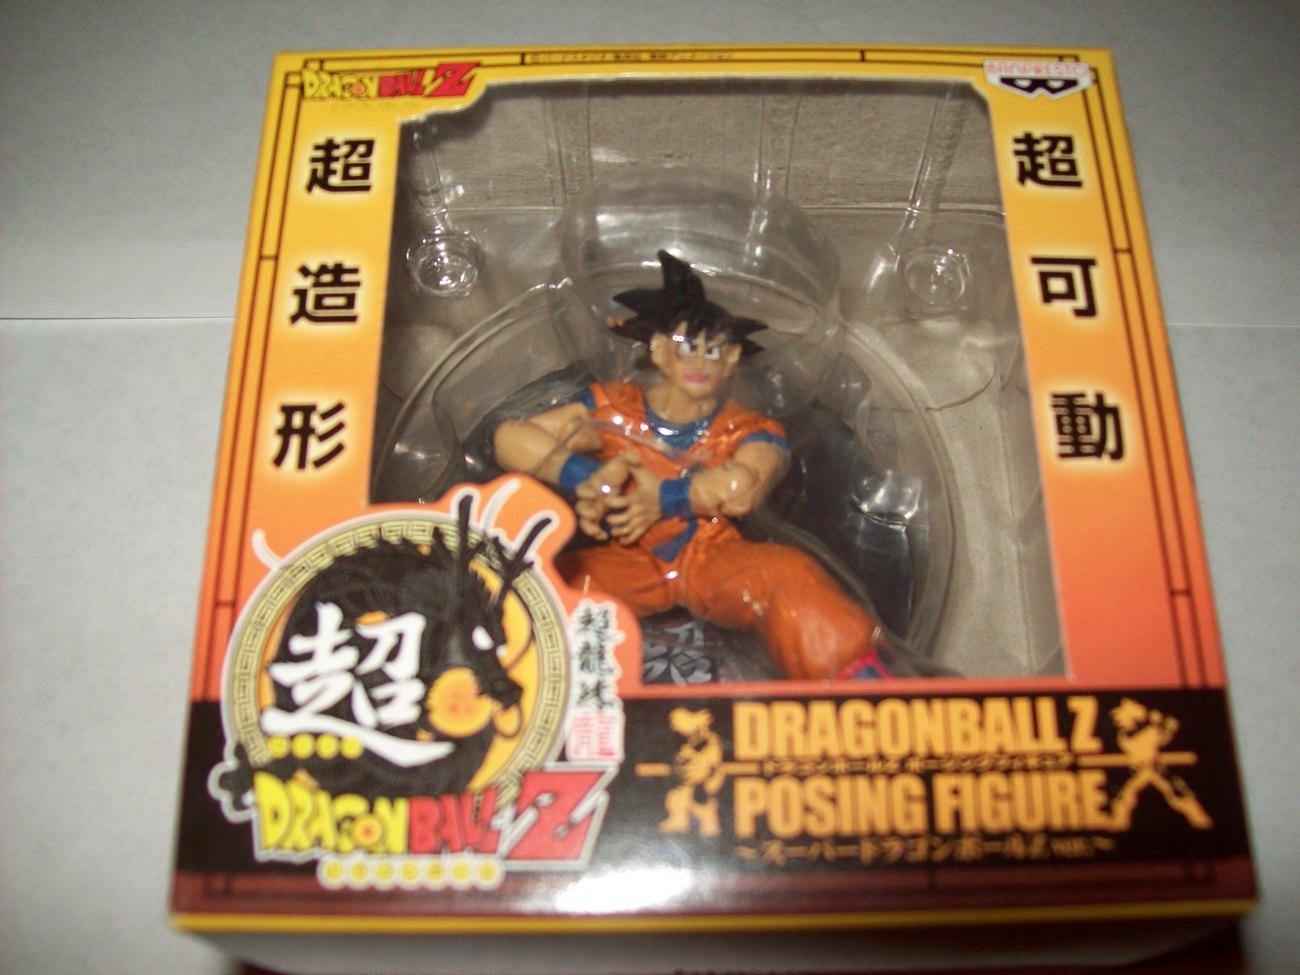 "FREE SHIP goku dragonball z banpresto posing figure 2.5"" prize nib toy"